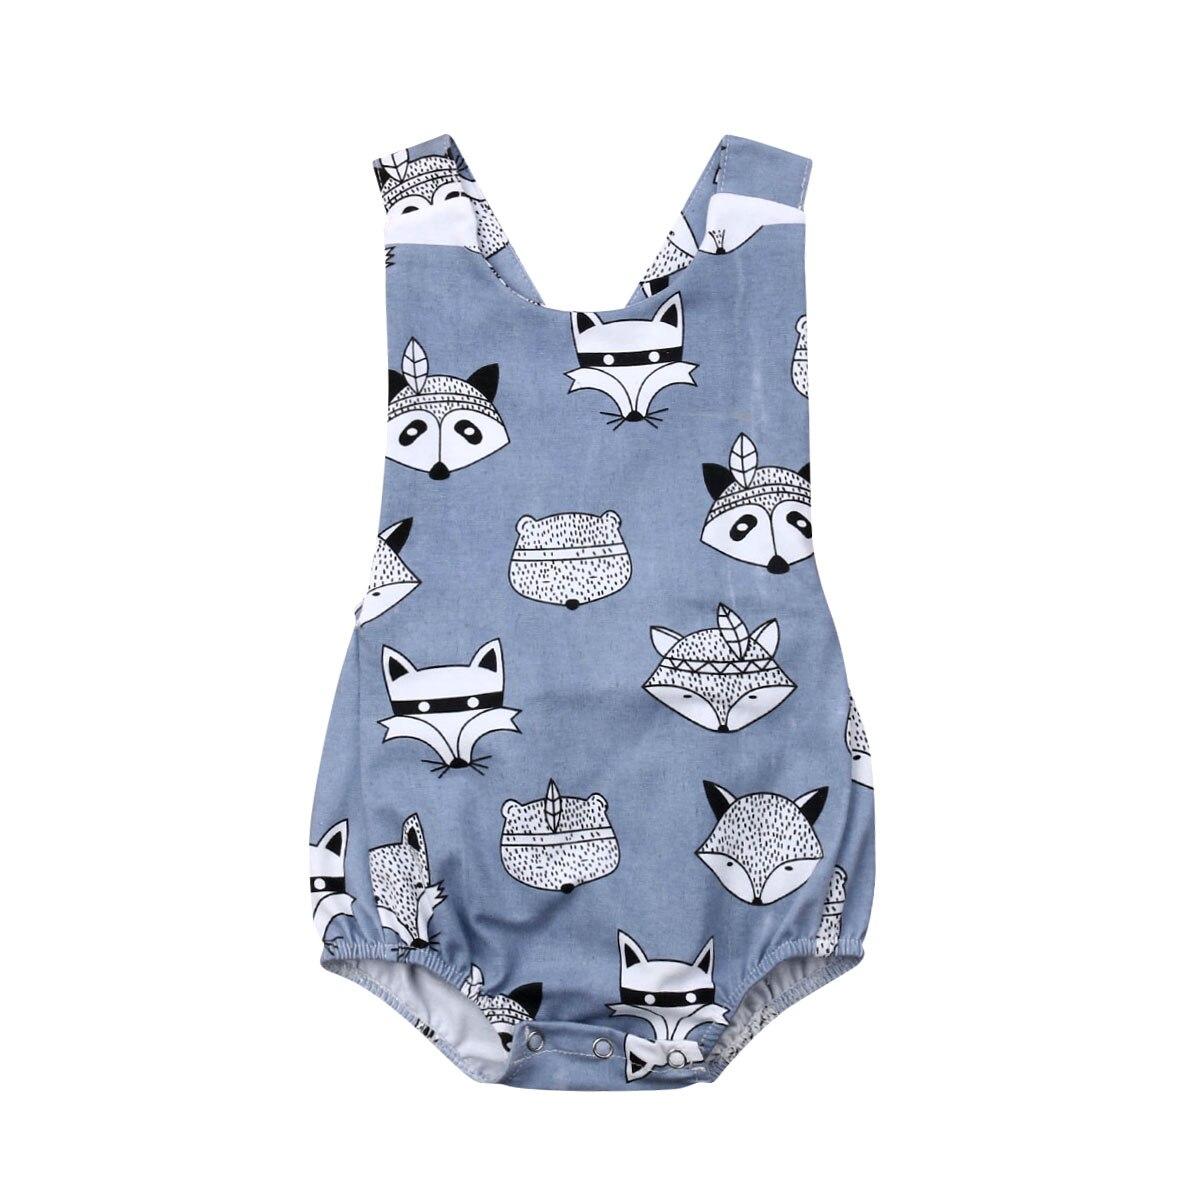 Pudcoco Newborn Infant Baby Boy Girl Cute Bodysuit  Jumpsuit Clothes Outfit